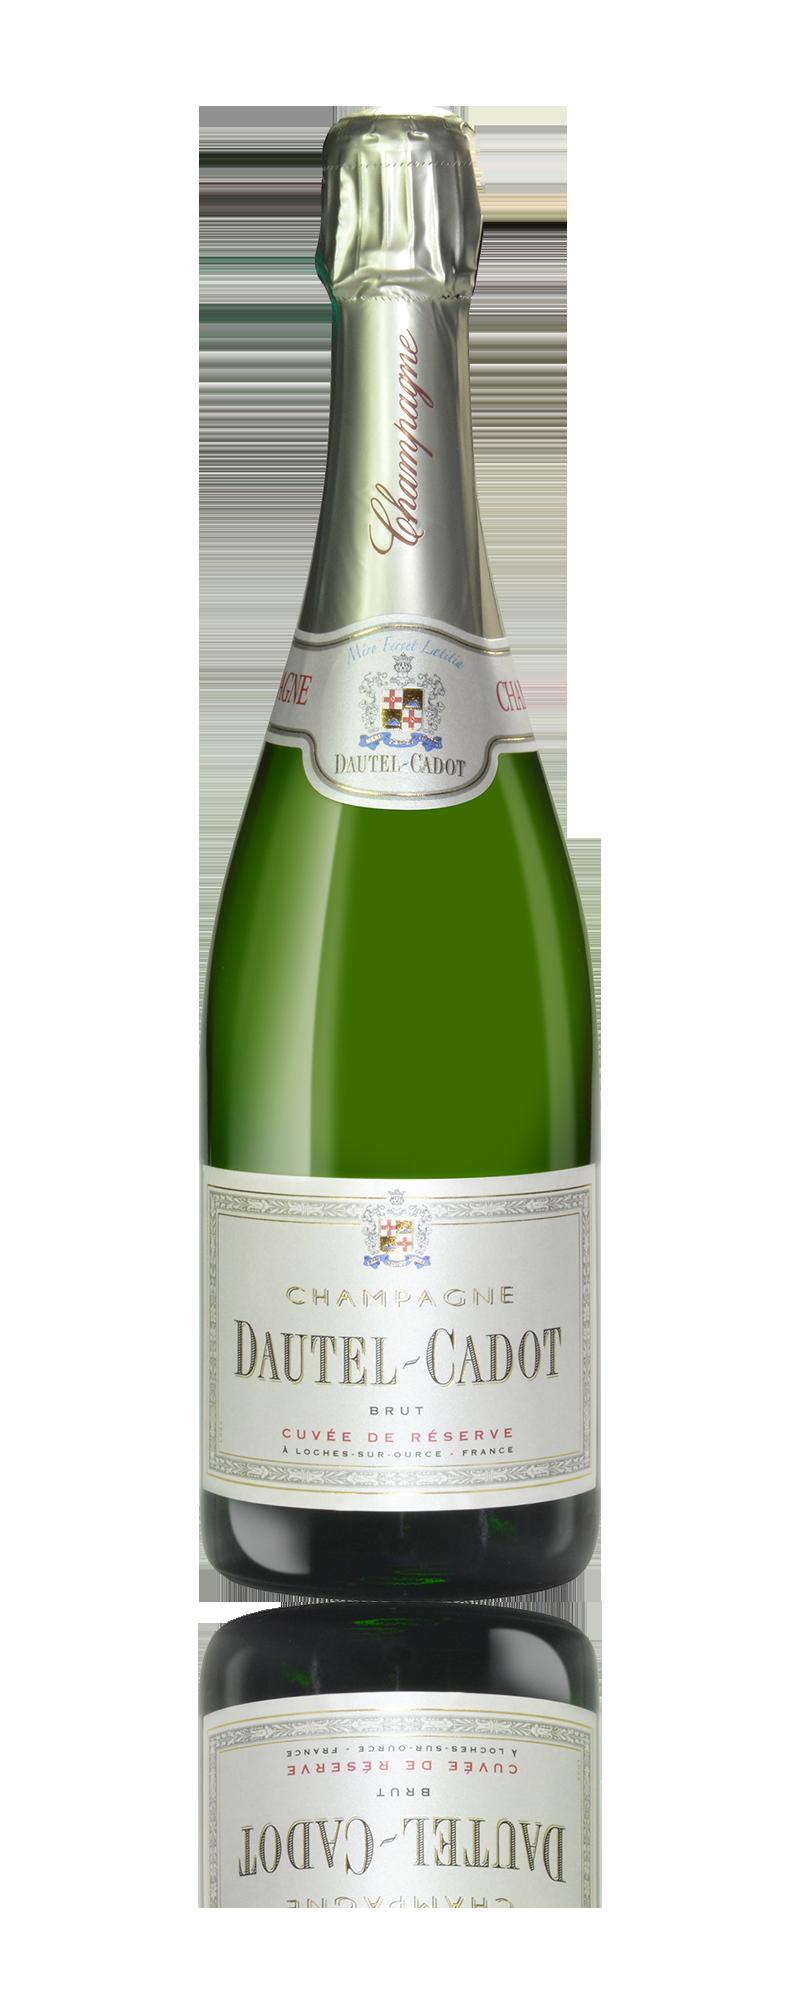 champagne-dautel-cadot-cuvee-reserve